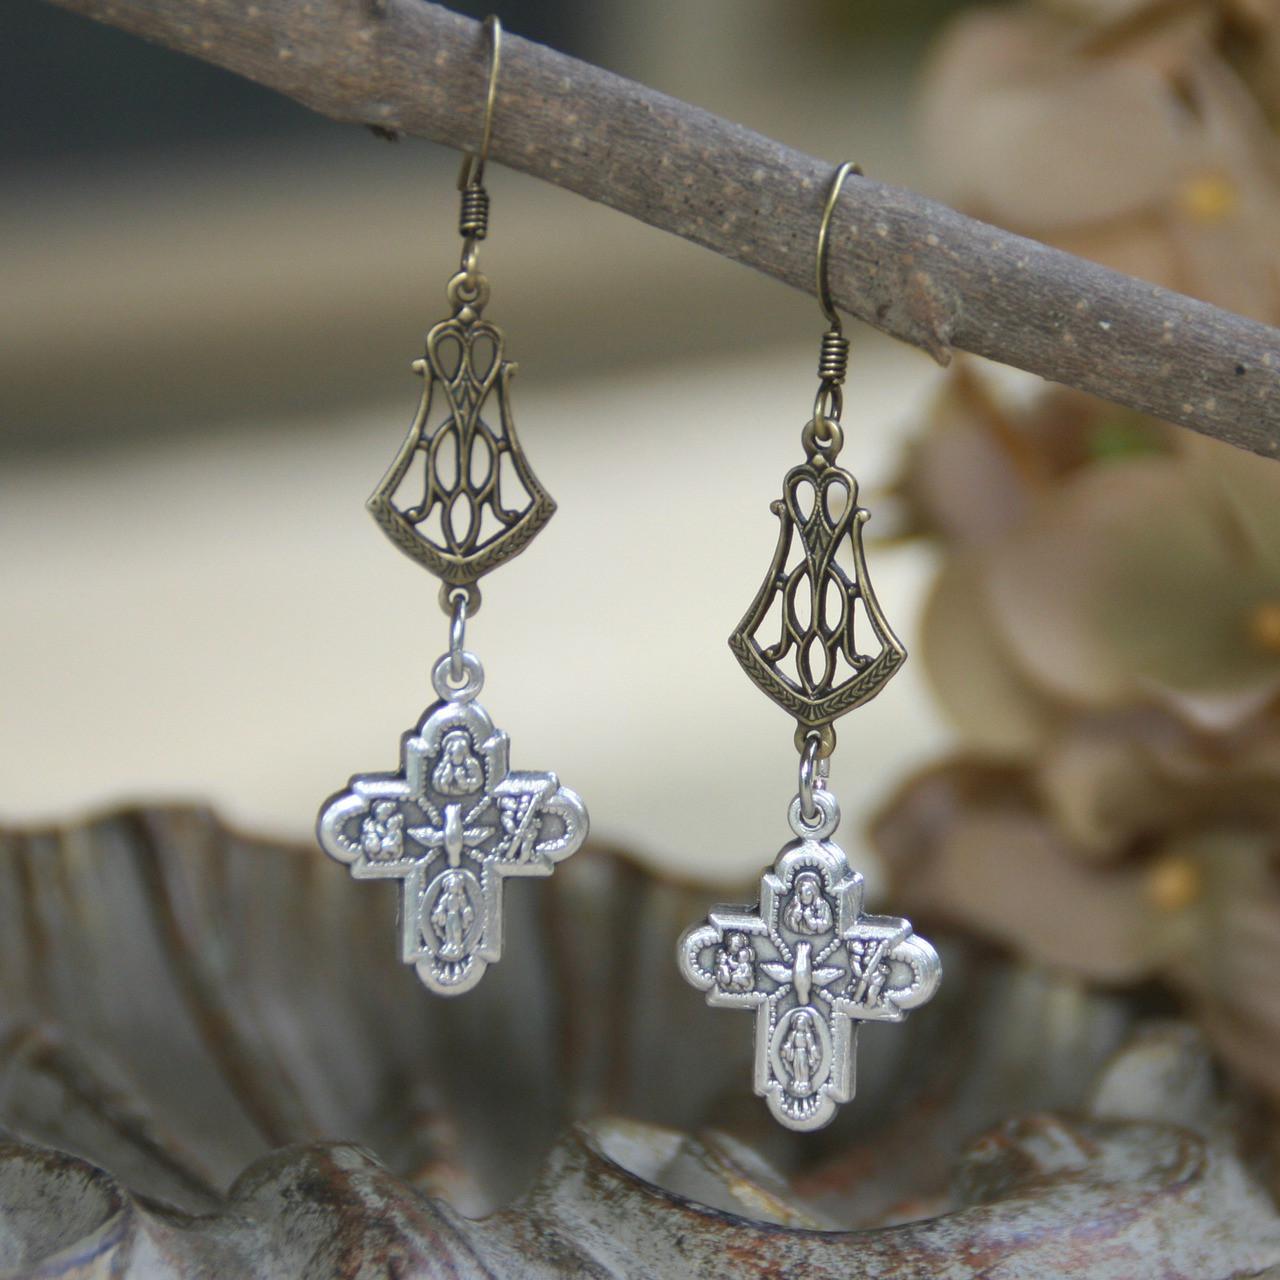 IN-61 Four Way Catholic Medal Earrings